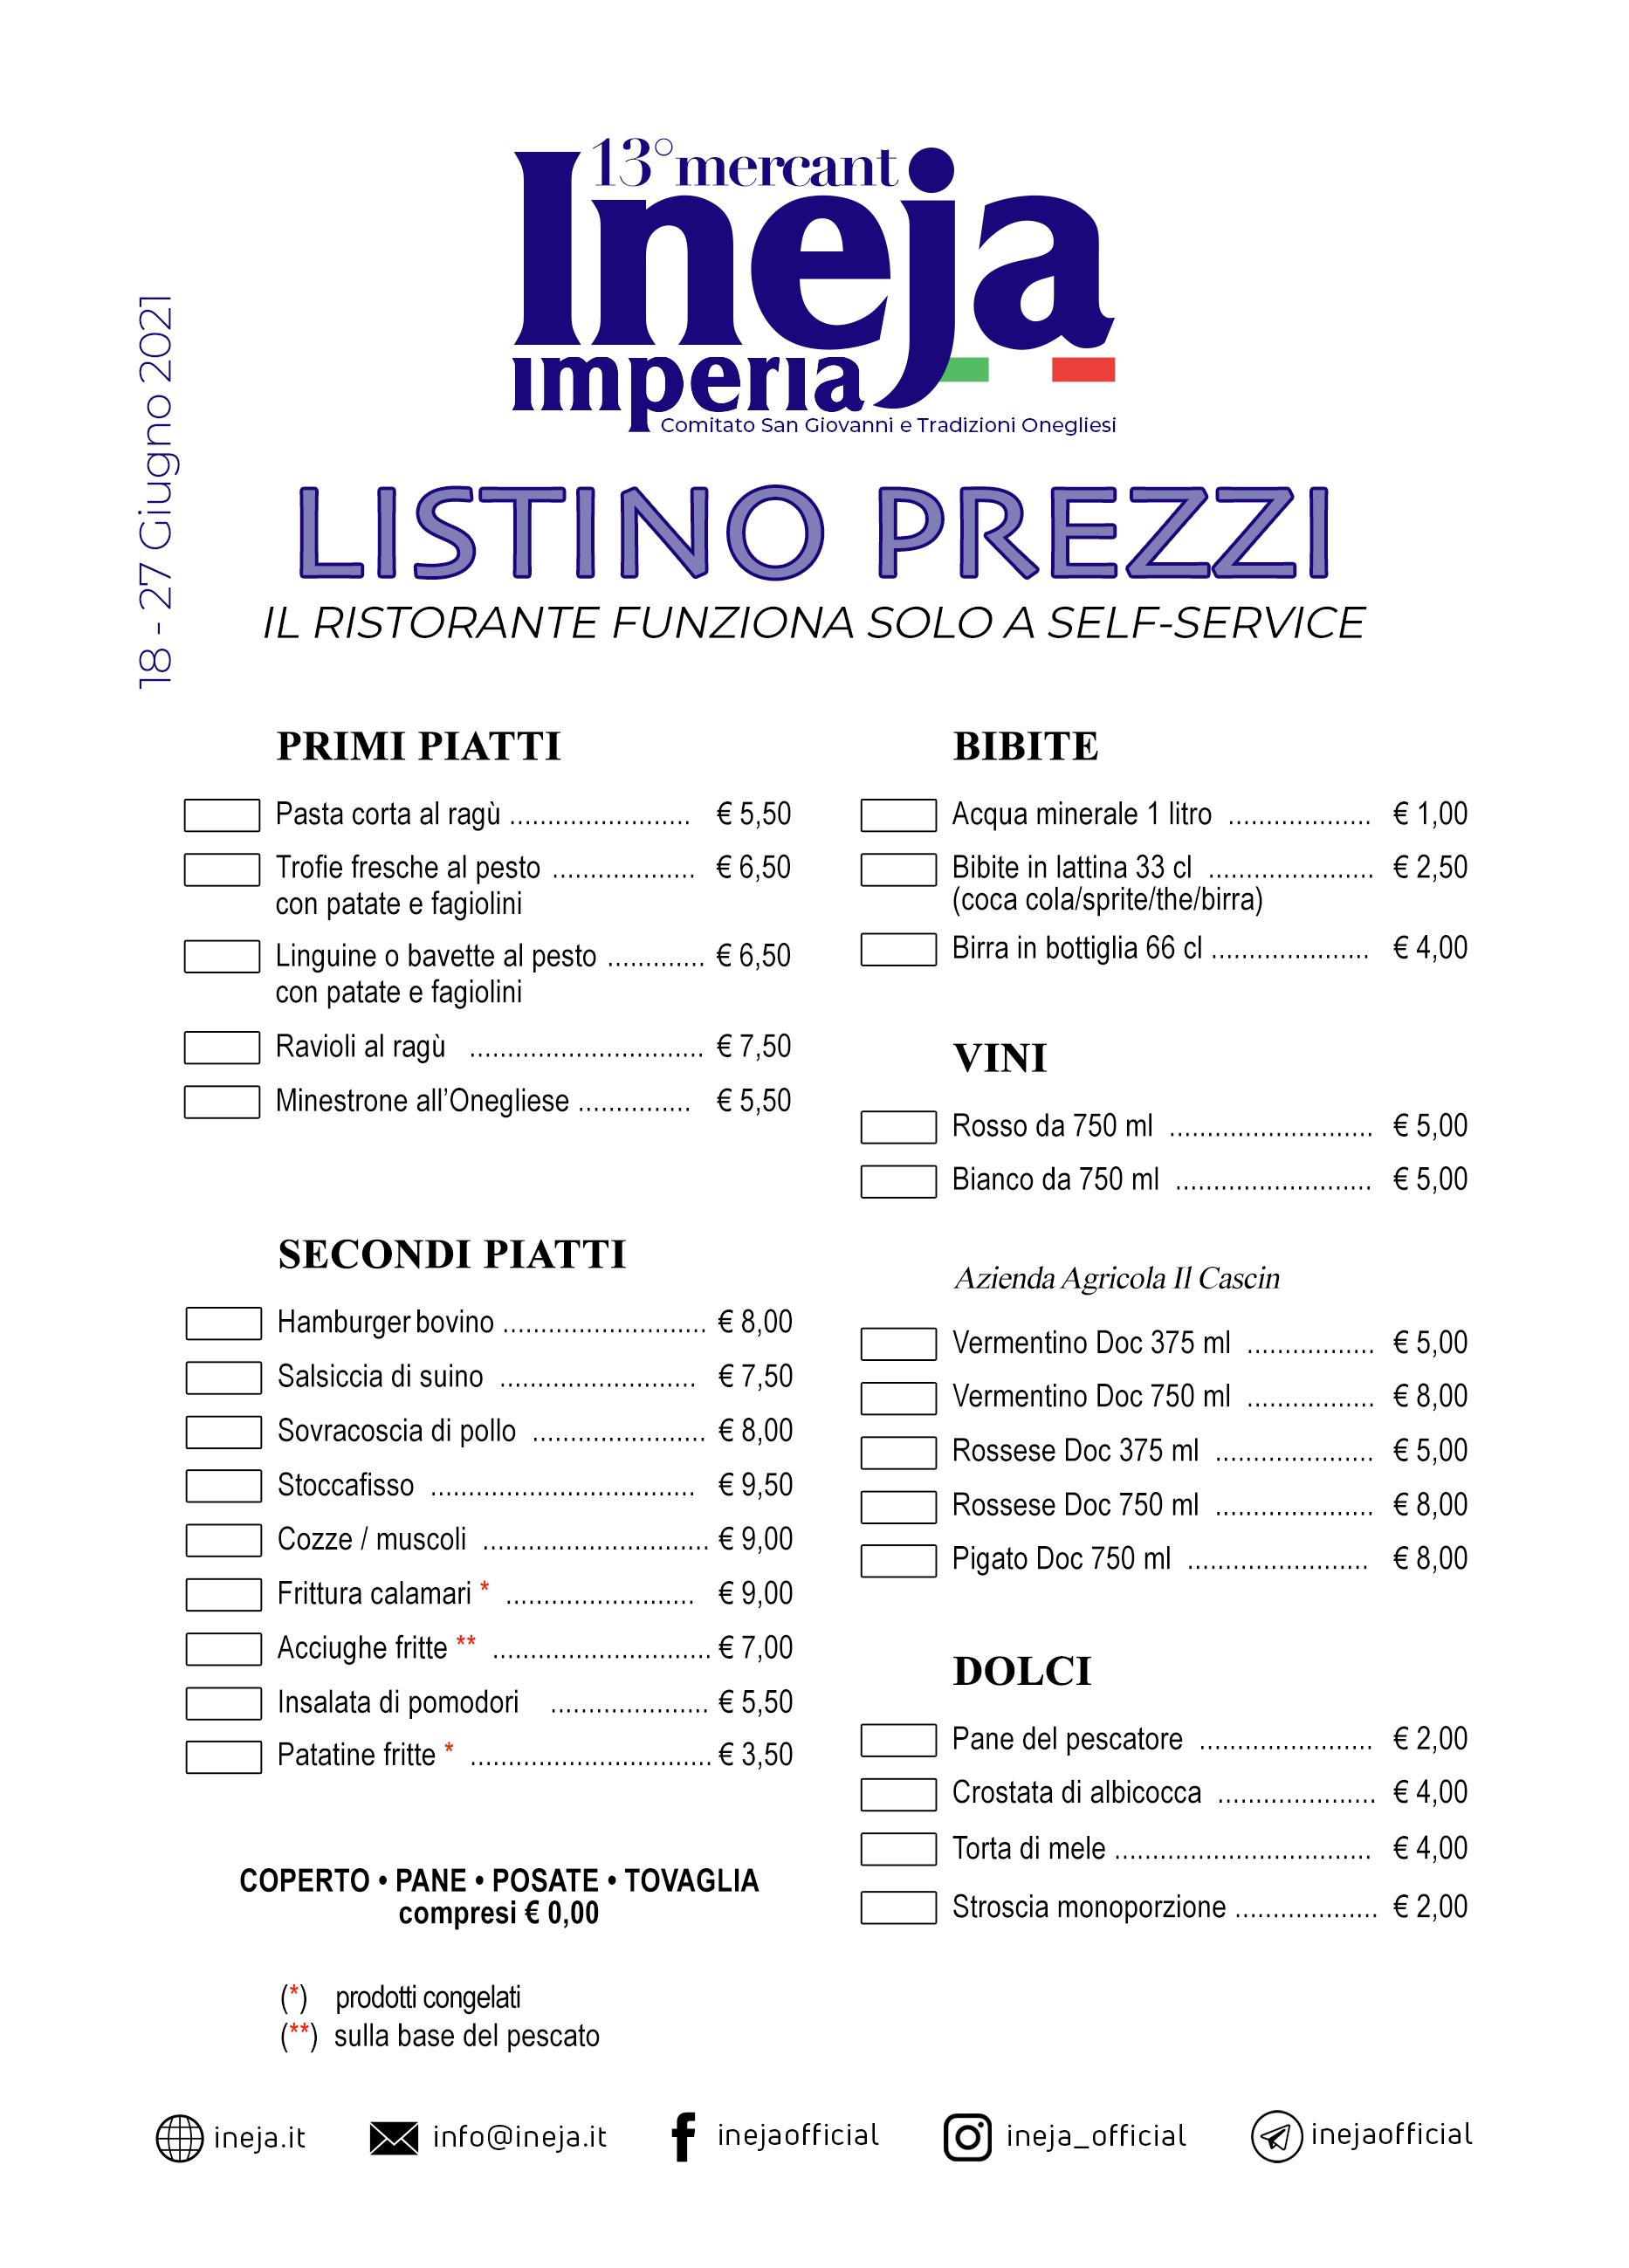 a5_menu_front_ineja2021